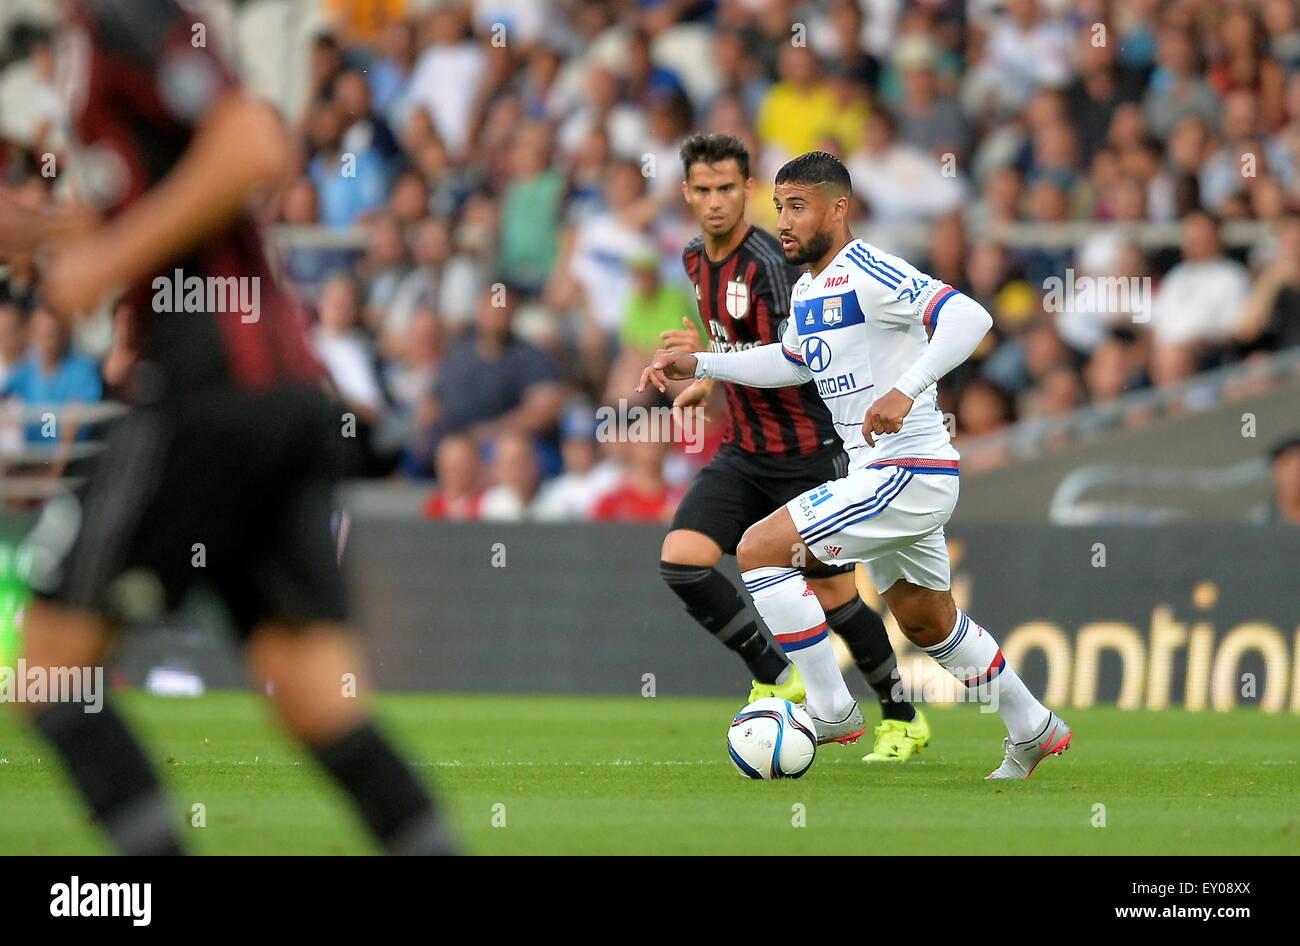 18.07.2015. stade de gerland, Lyon, France, Preseason football friendly, Lyon versus AC Milan. Nabil Fekir (ol) Stock Photo